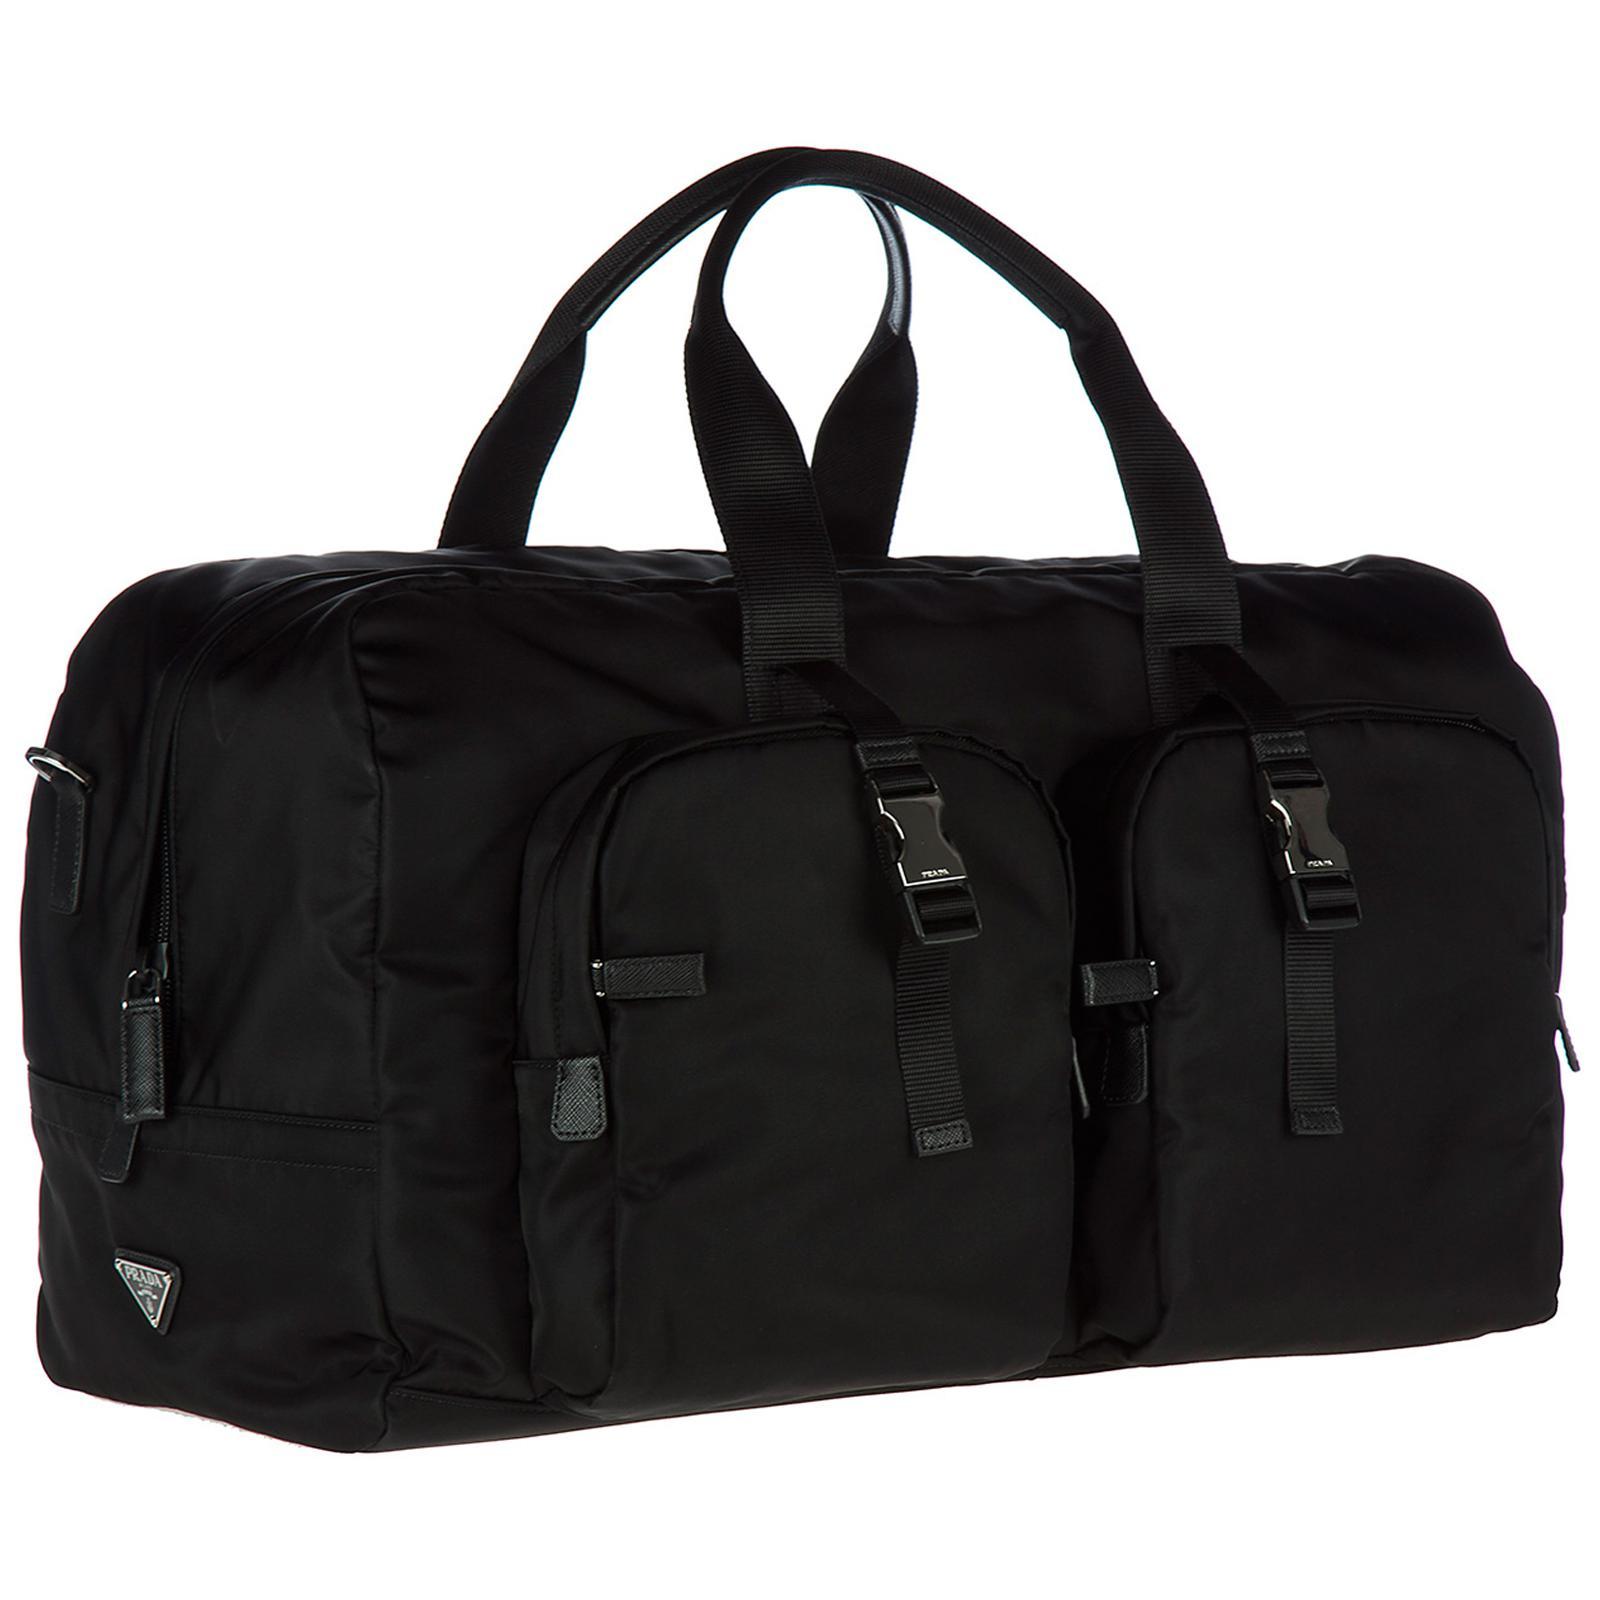 6b29afd62833 66e2d 49fef spain prada black travel duffle weekend shoulder bag nylon for  men lyst. view fullscreen 953c6 ...